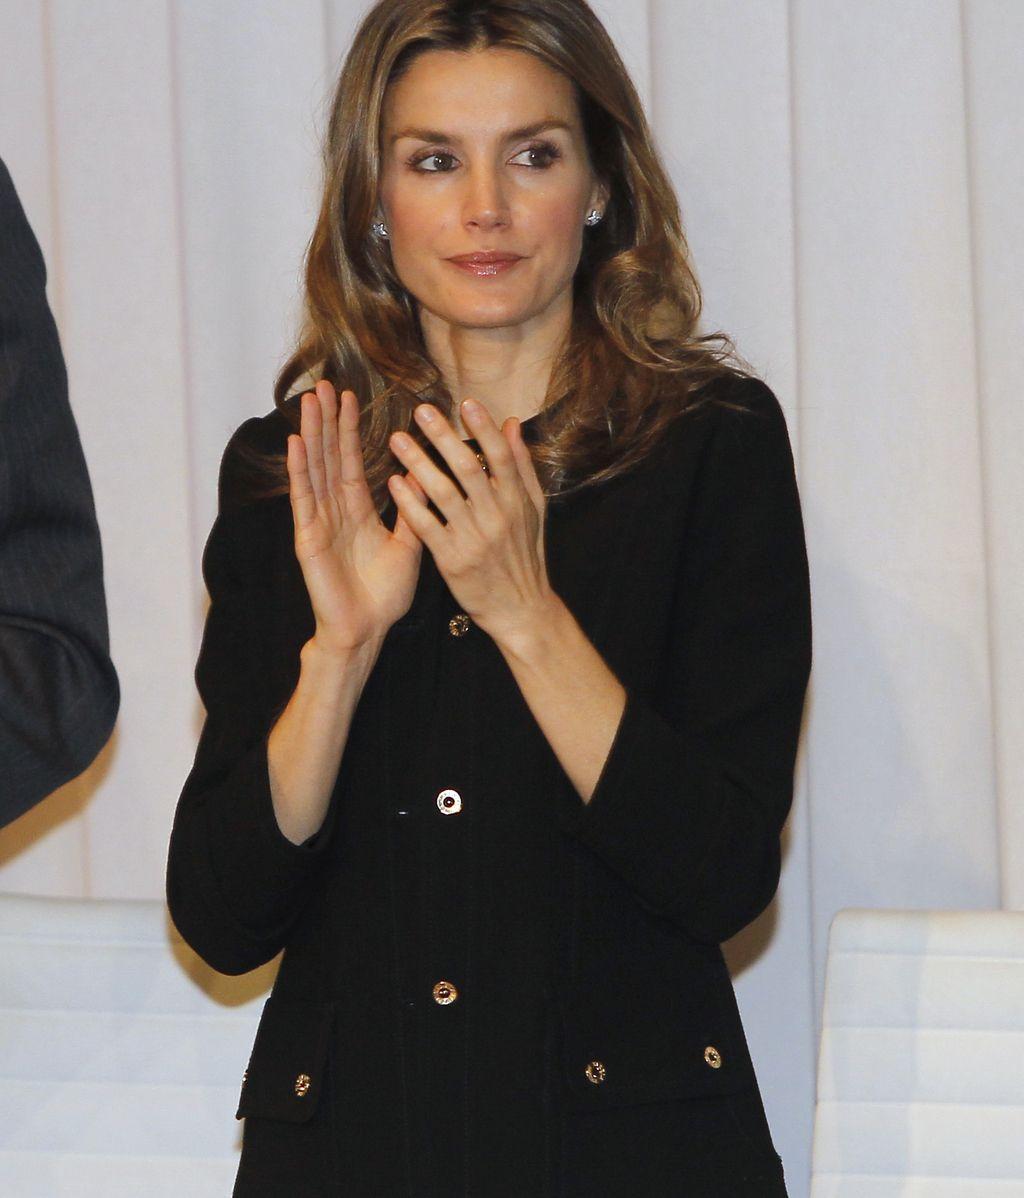 La Princesa Letizia ya no luce su anillo de compromiso